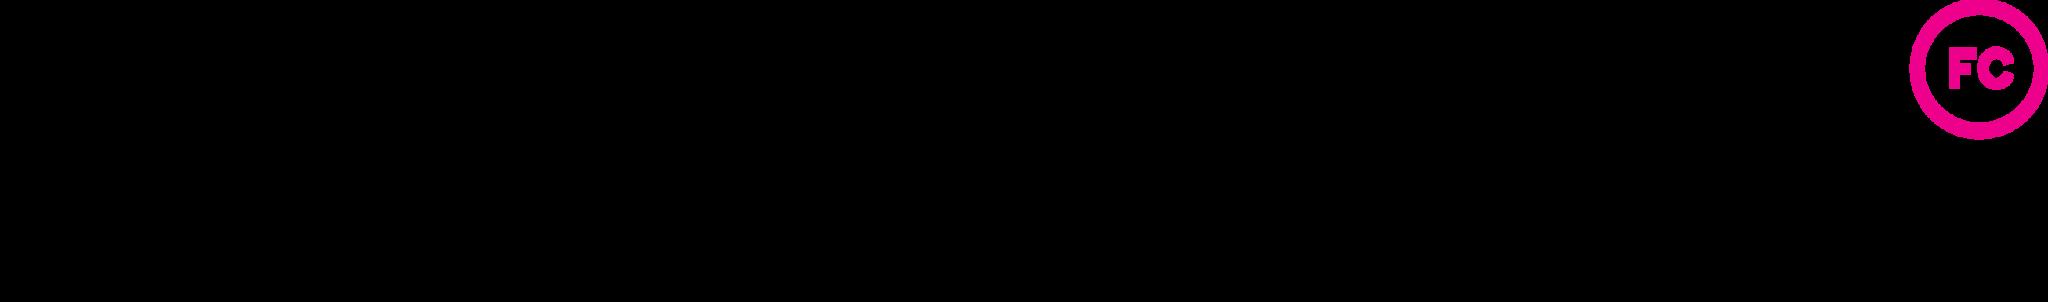 Logo fashion cheque